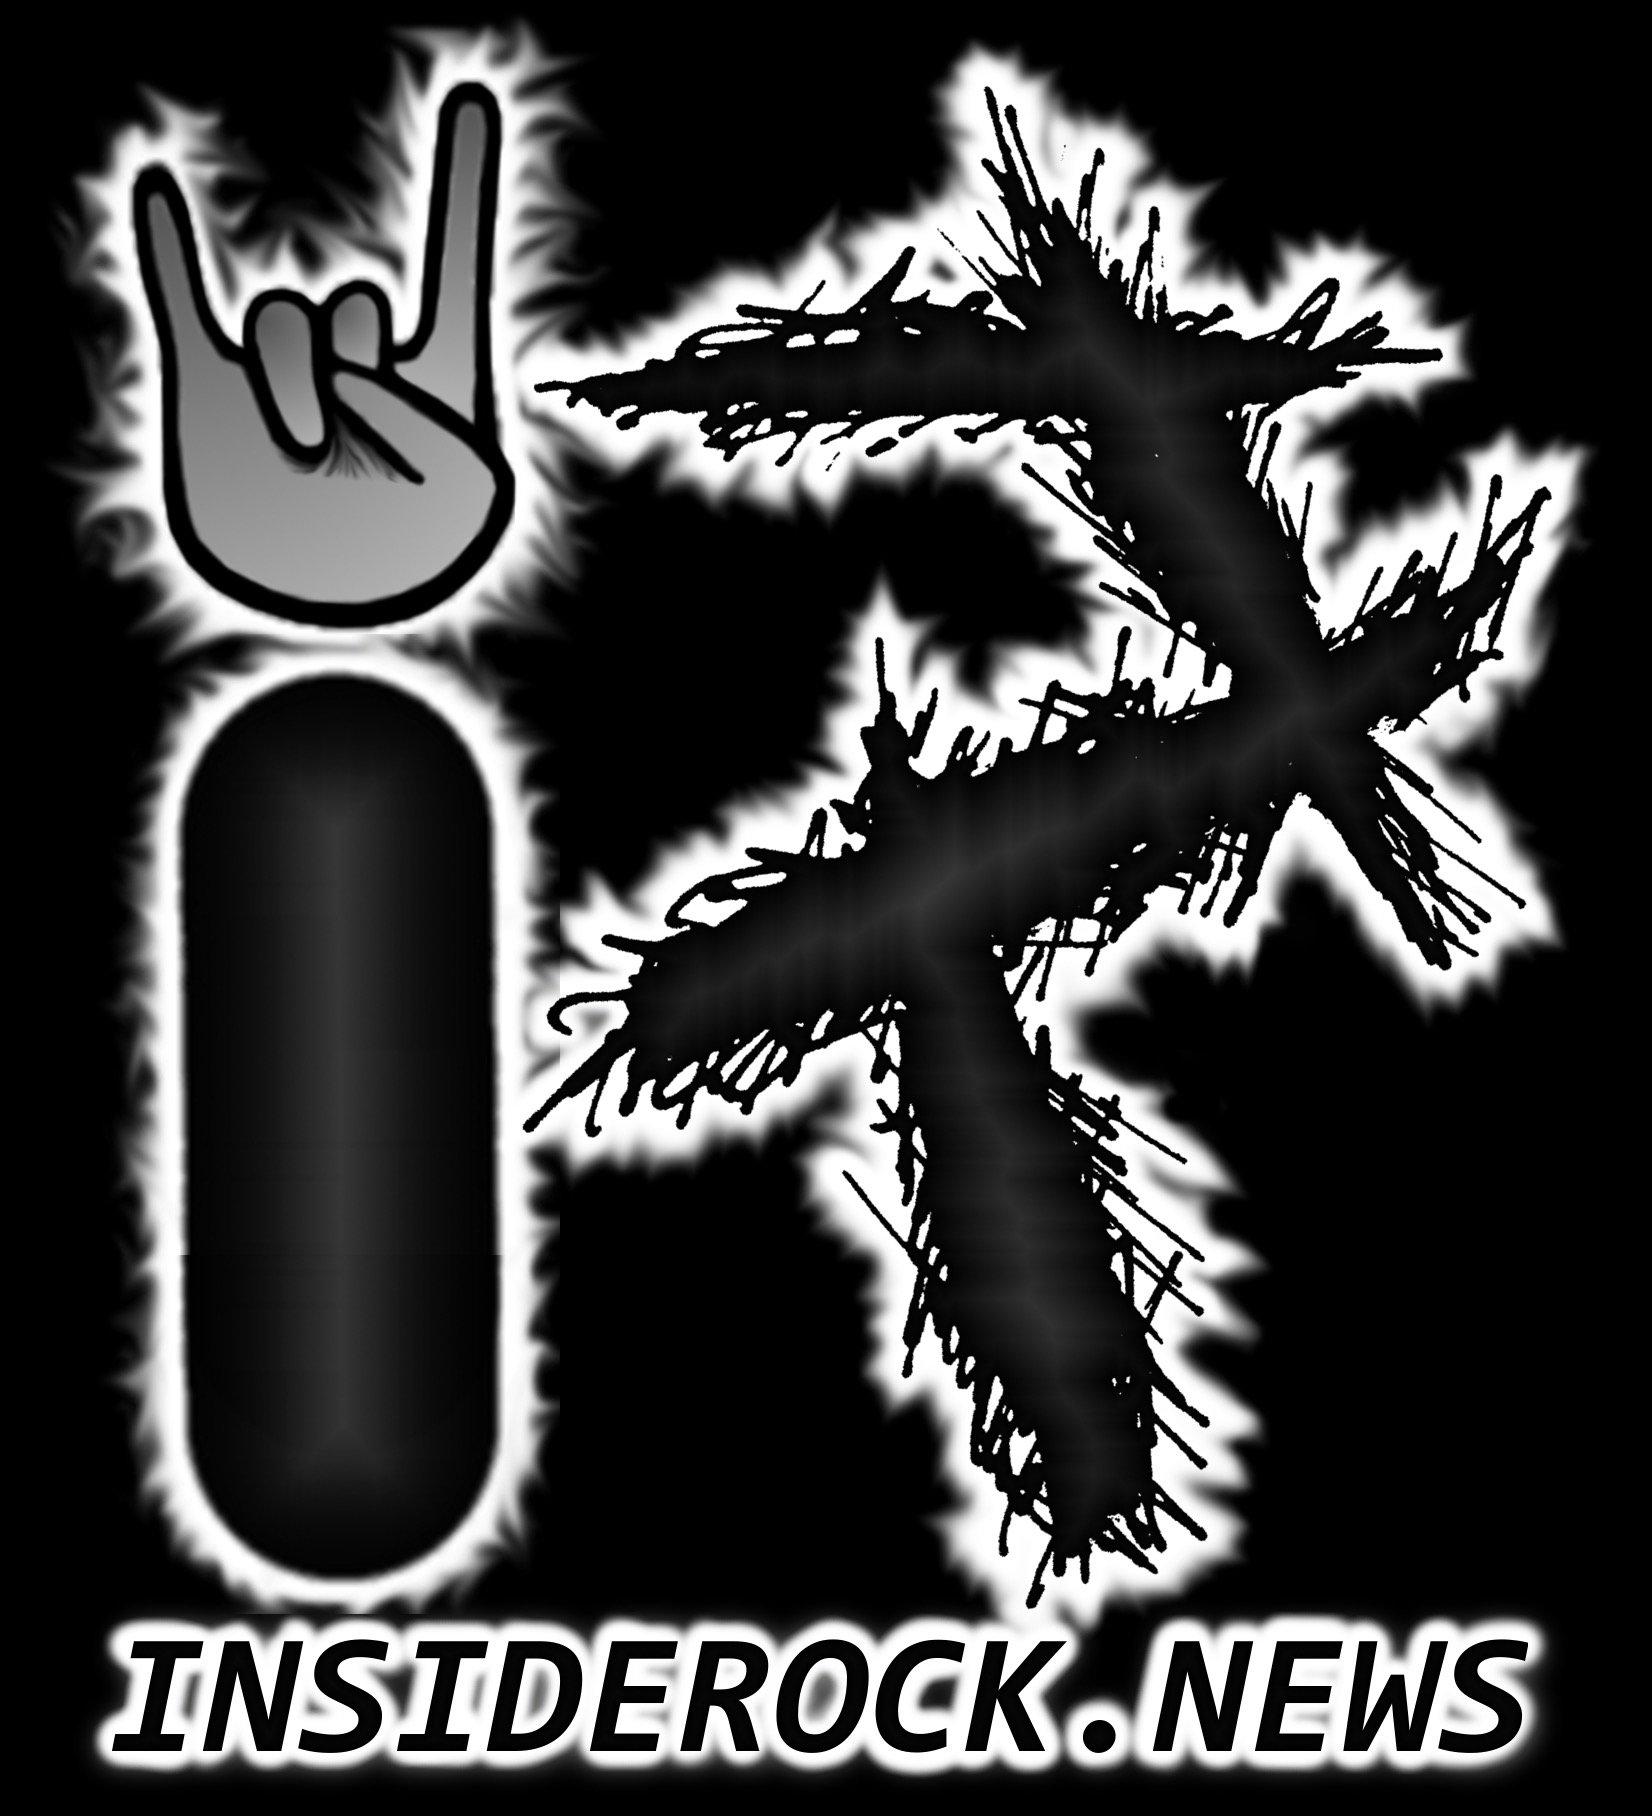 InsideRock.News